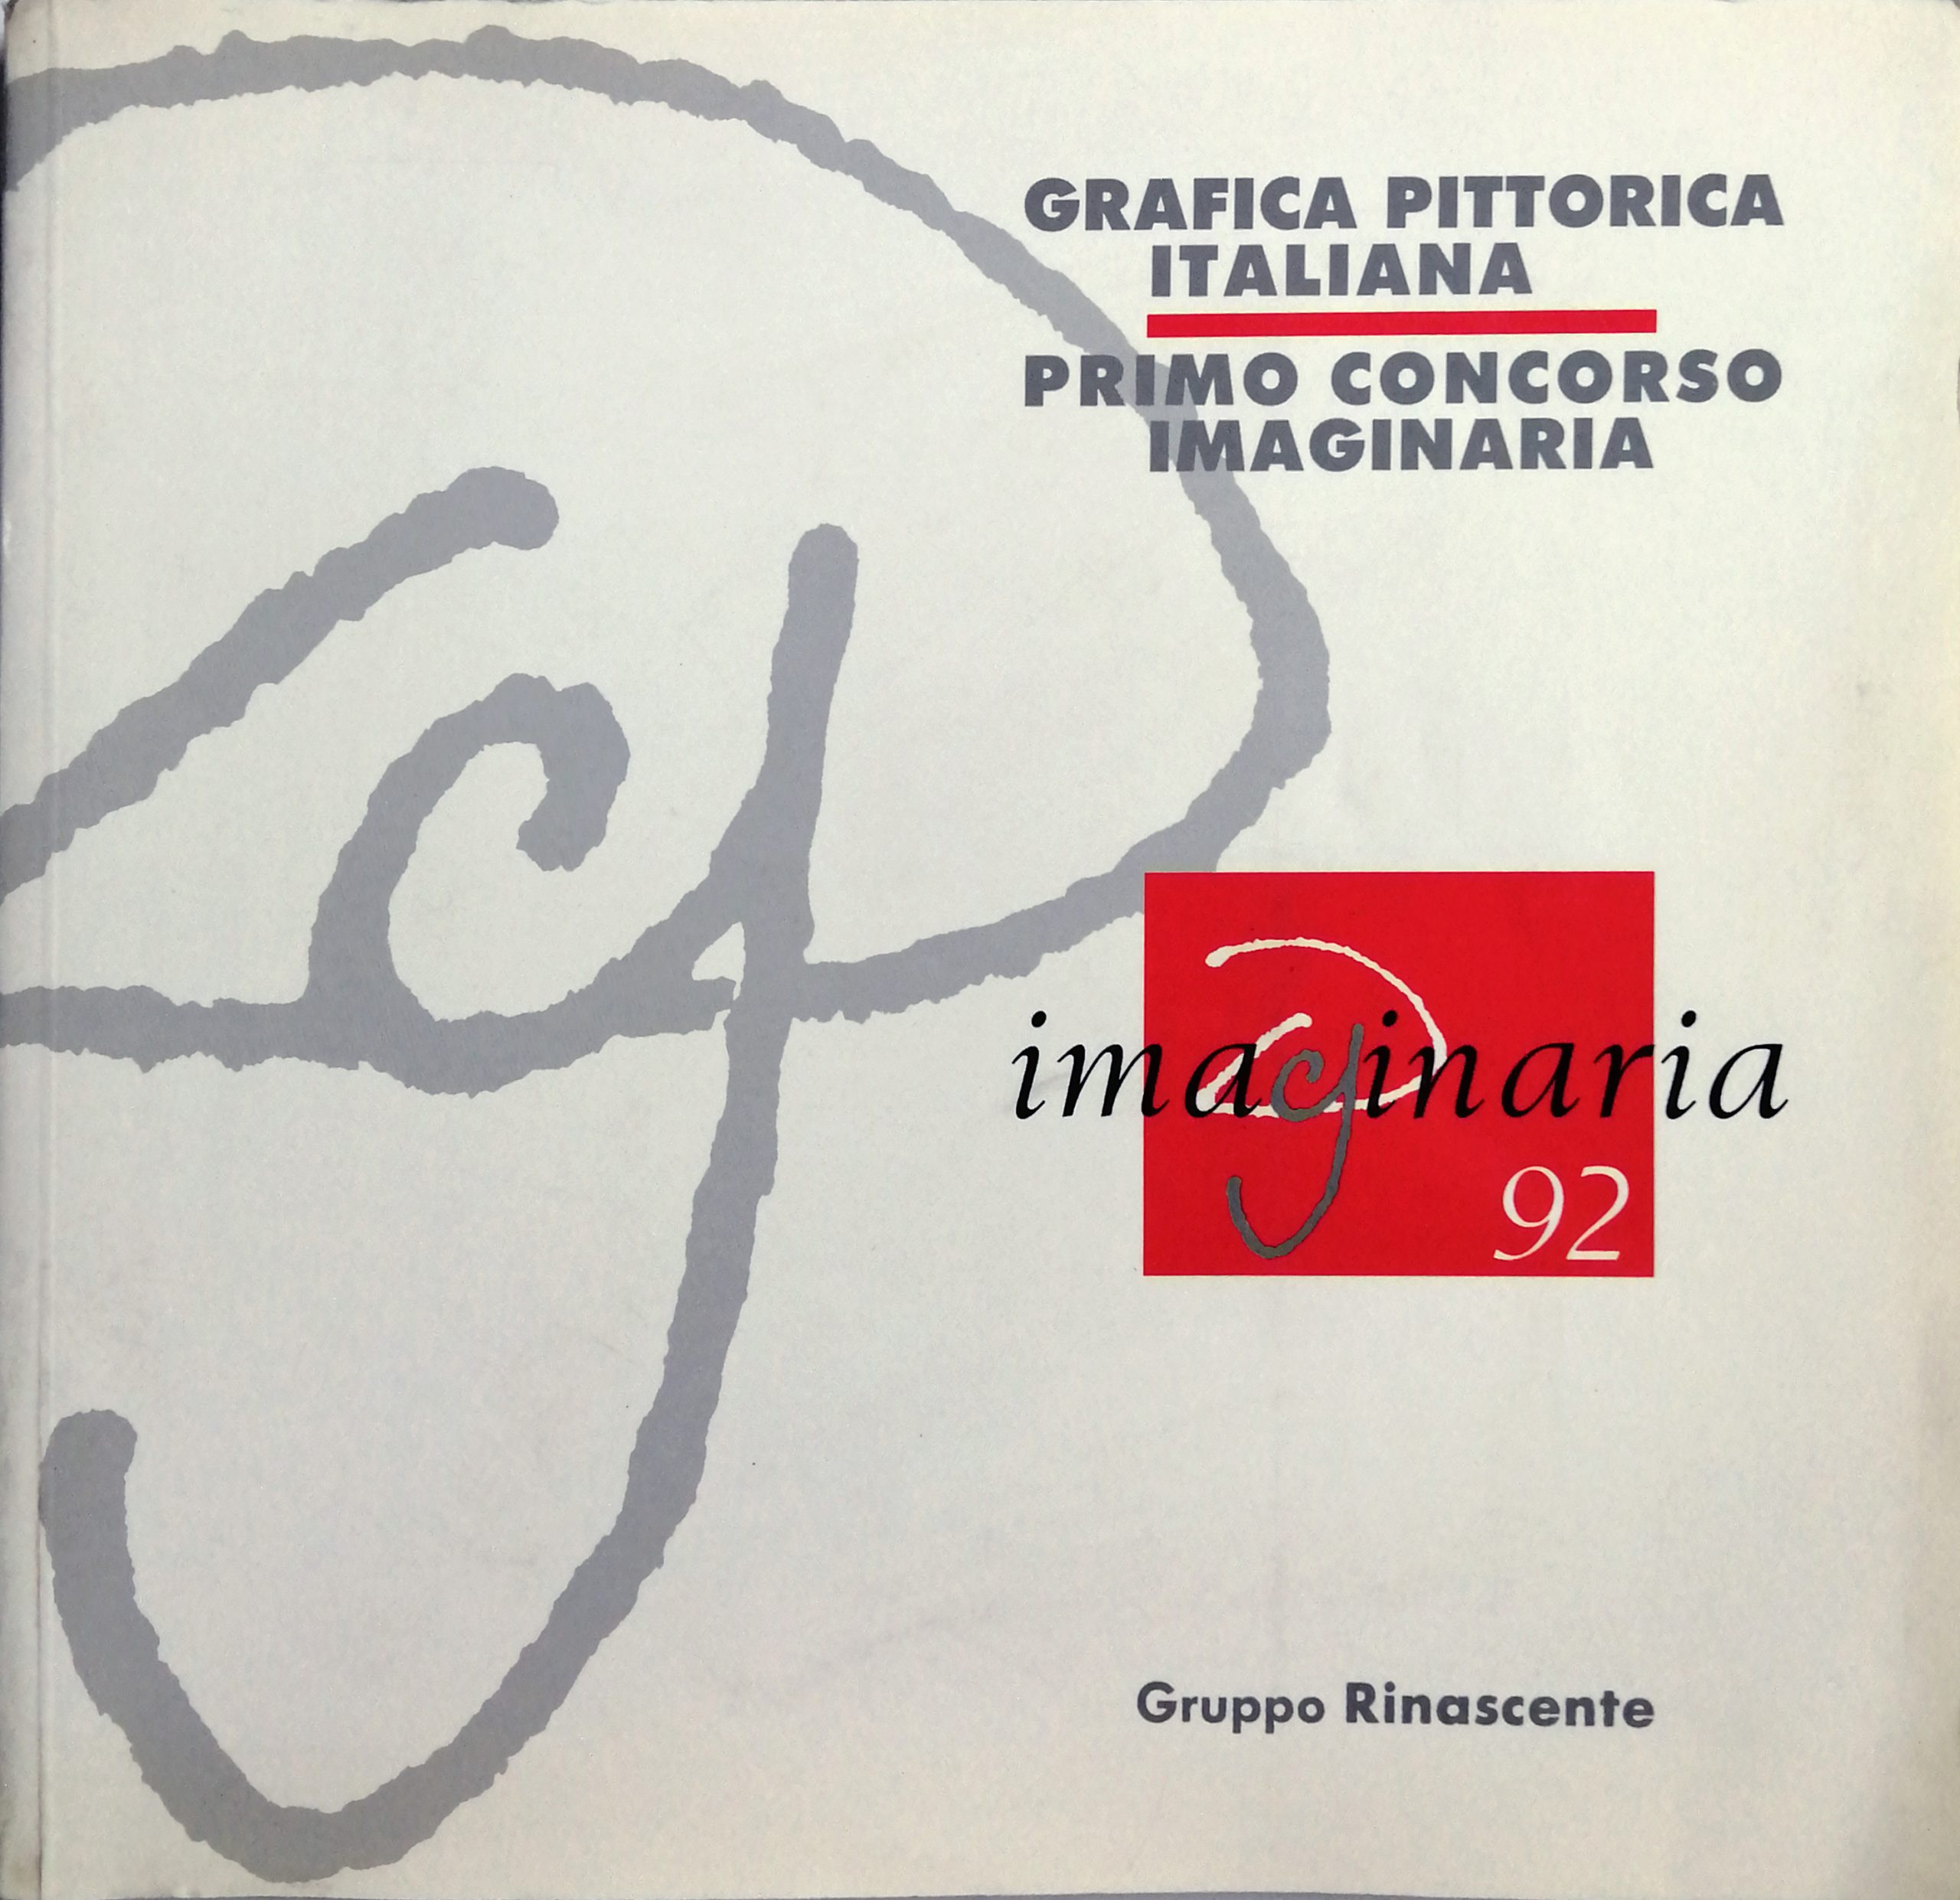 1992 Imaginaria Milano scaled - Bibliography/ Catalogues